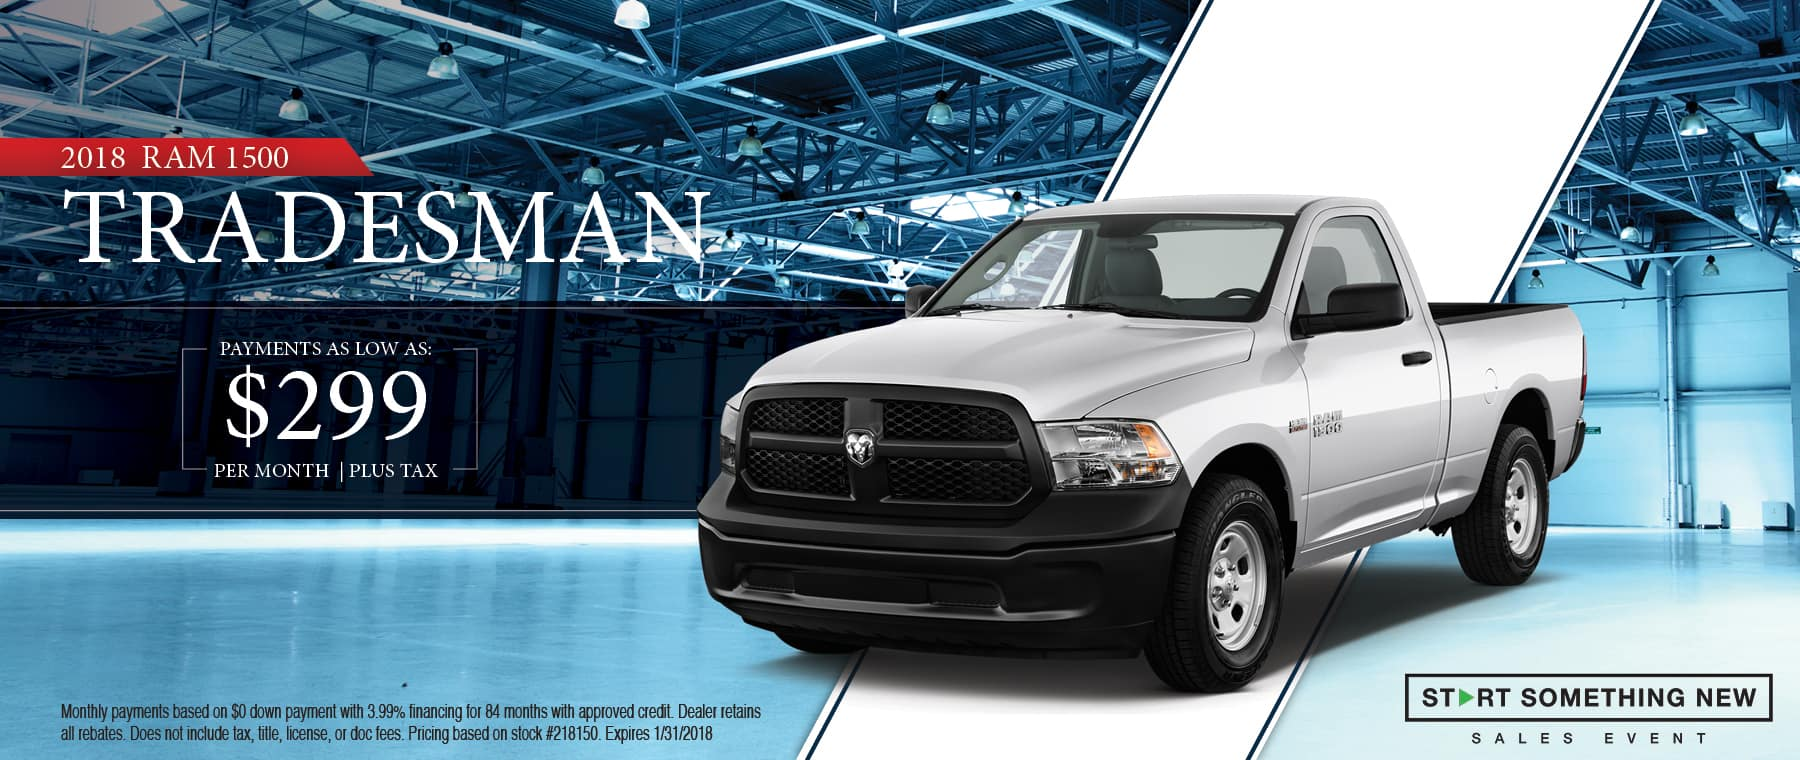 2018 RAM 1500 Tradesman Special in Thomson, GA